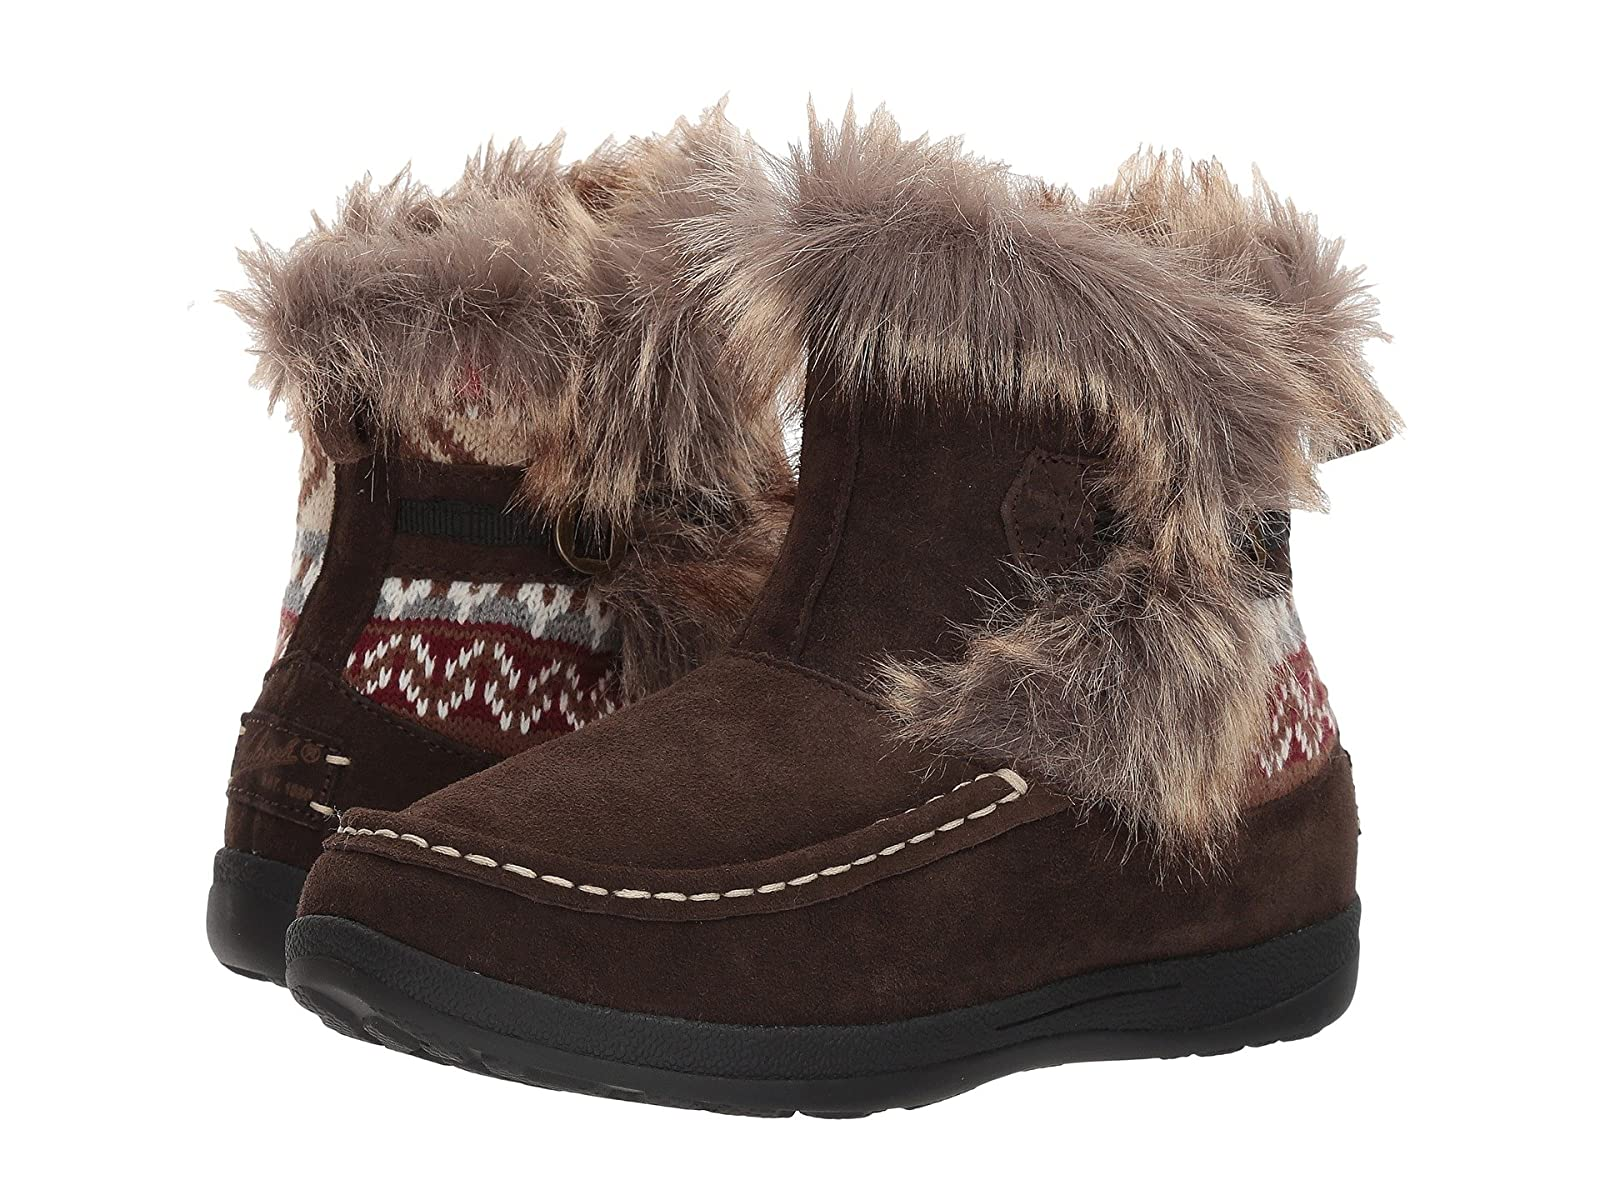 Woolrich Pine Creek IICheap and distinctive eye-catching shoes